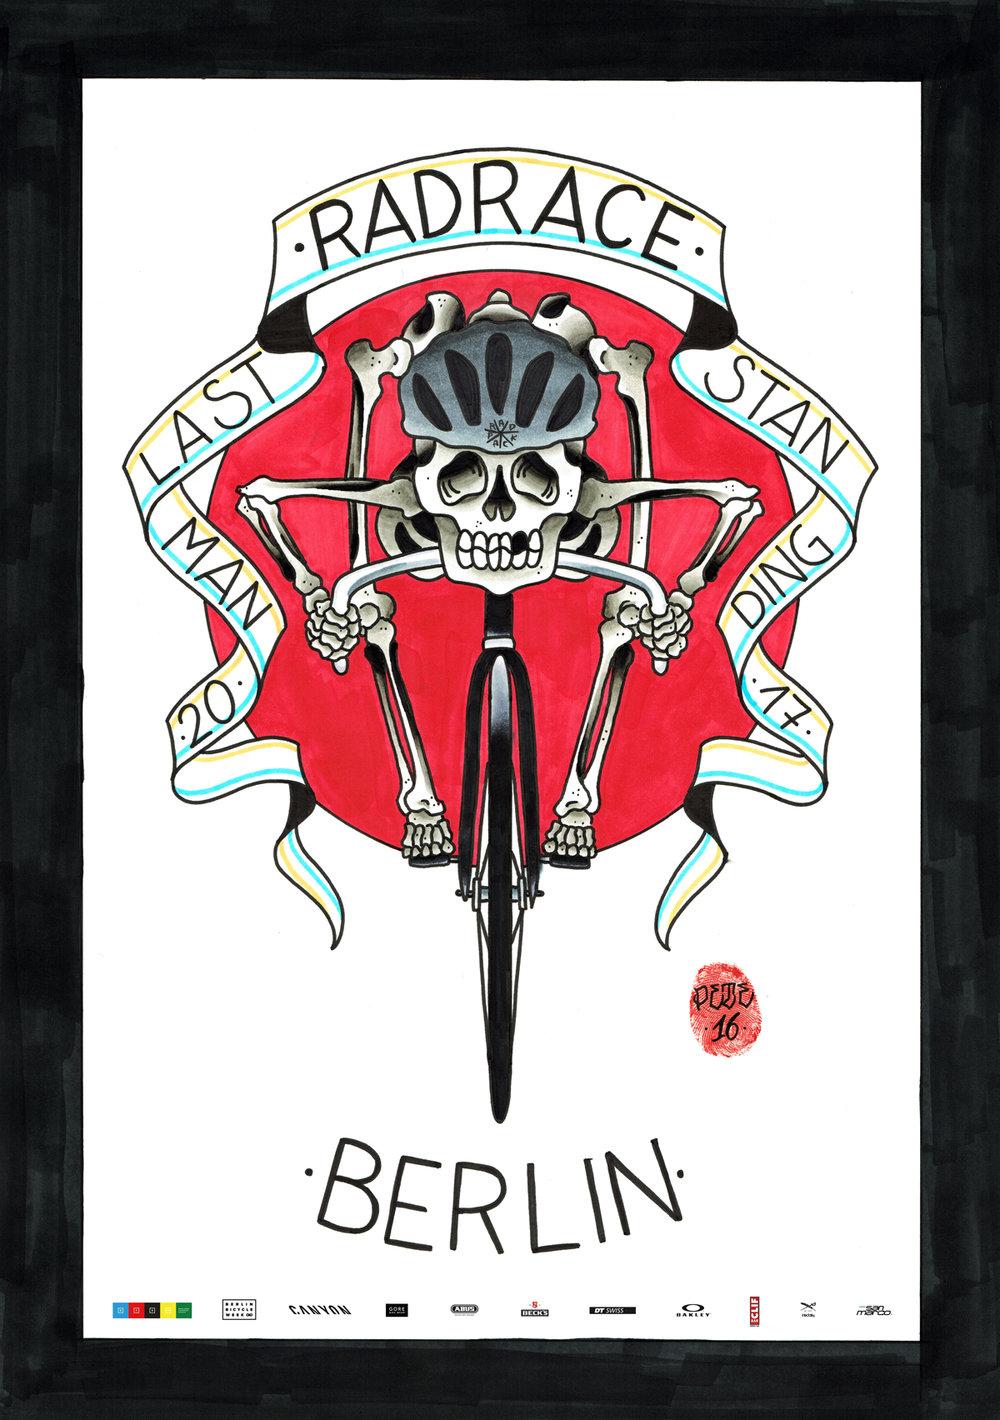 RAD RACE LAST MAN STANDING BERLIN 04.03.2017